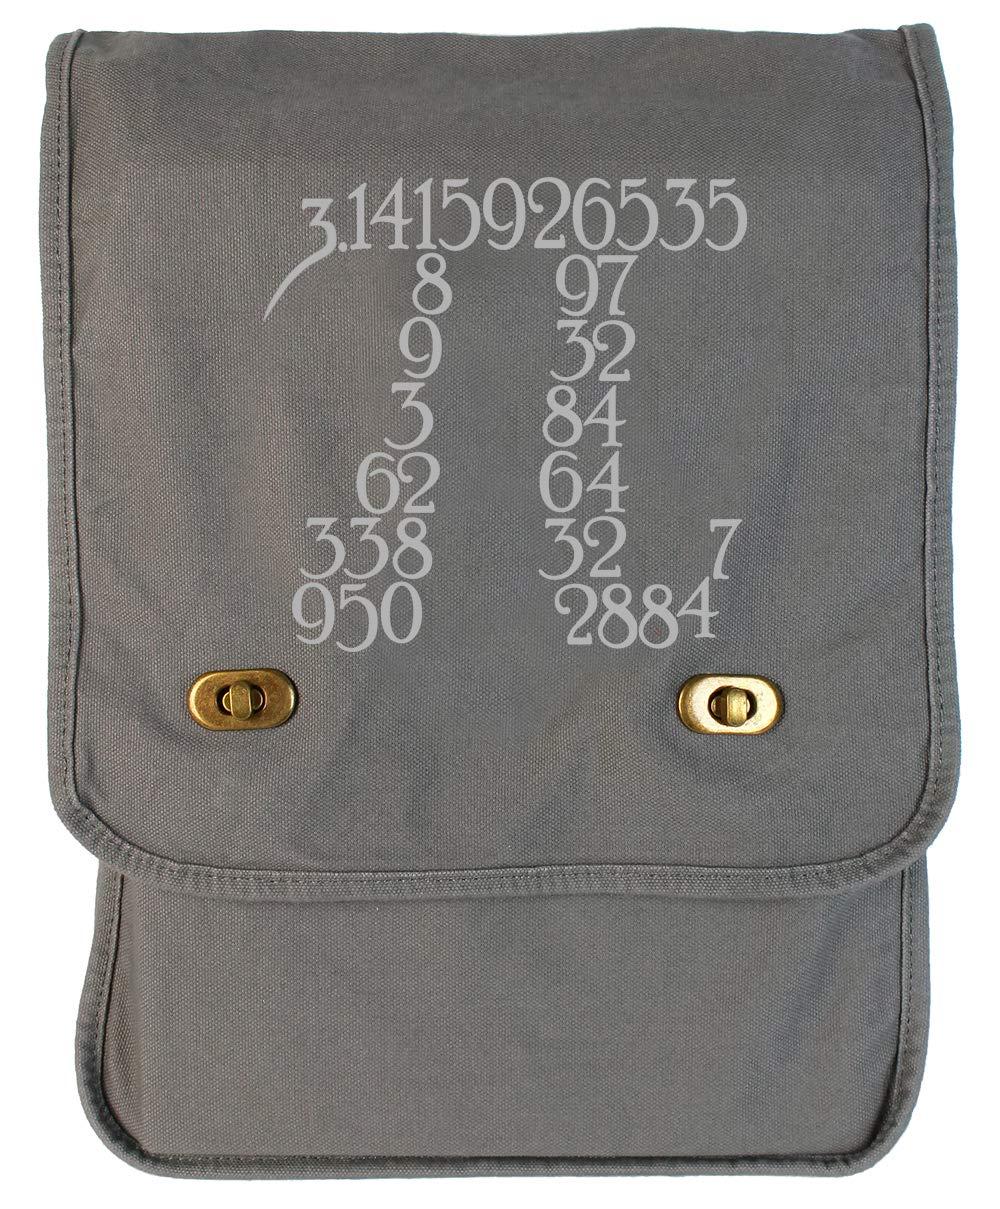 Tenacitee Pi within Pi Flamingo Raw Edge Canvas Messenger Bag